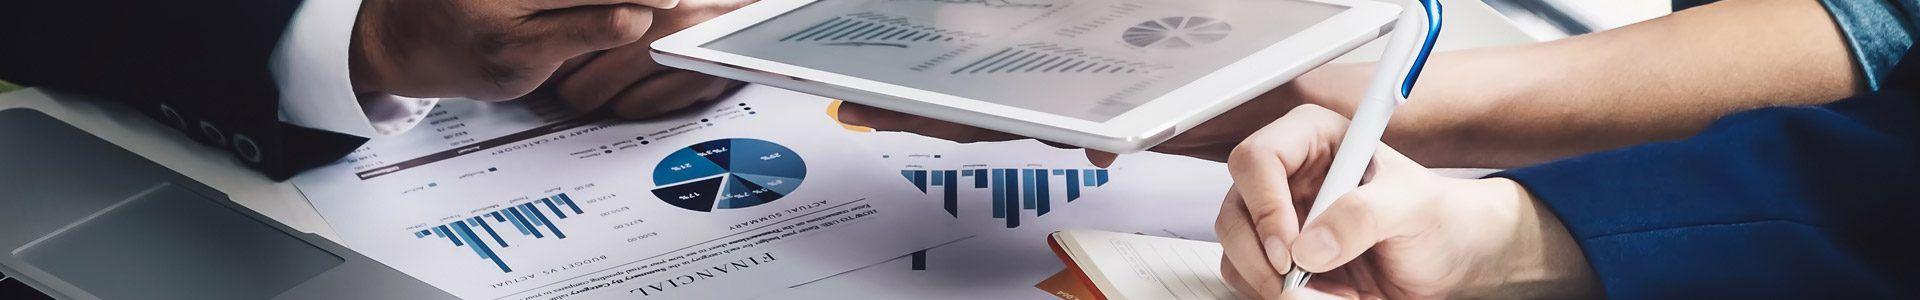 digitale-marketing-tips-categorie